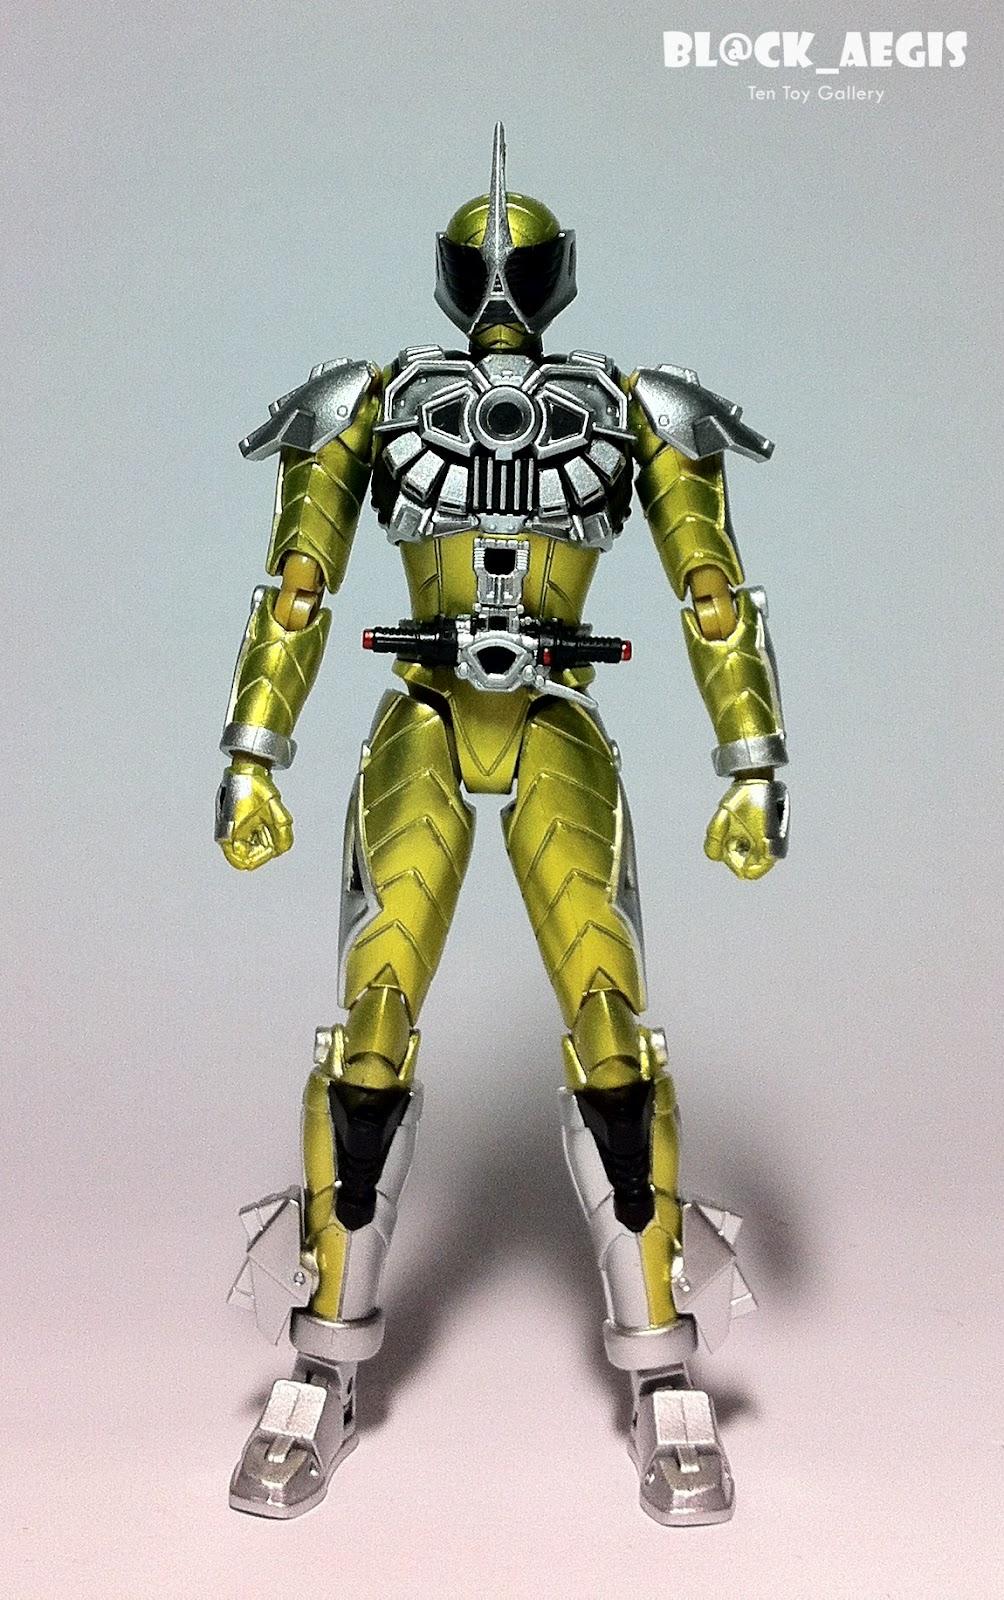 Ten Toy Gallery: Review: S.H.Figuarts Kamen Rider Accel  Kamen Rider Accel